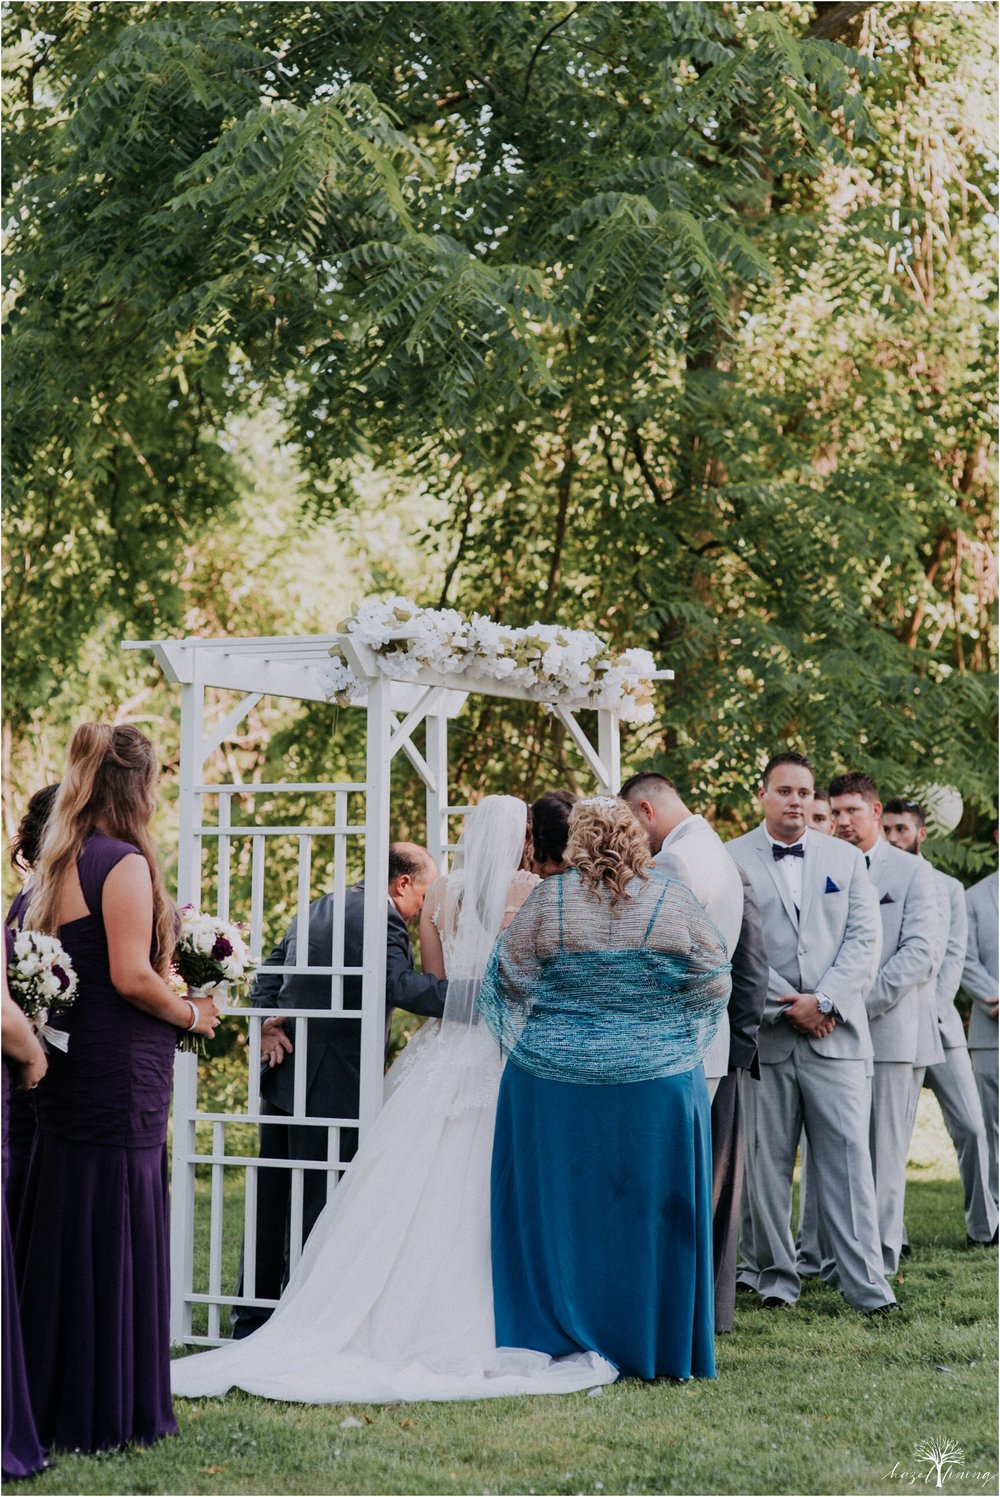 cassie-depinto-tyler-bodder-playwicki-farm-buck-hotel-featserville-trevose-pennsylvania-summer-outdoor-wedding-hazel-lining-travel-wedding-elopement-photography_0218.jpg